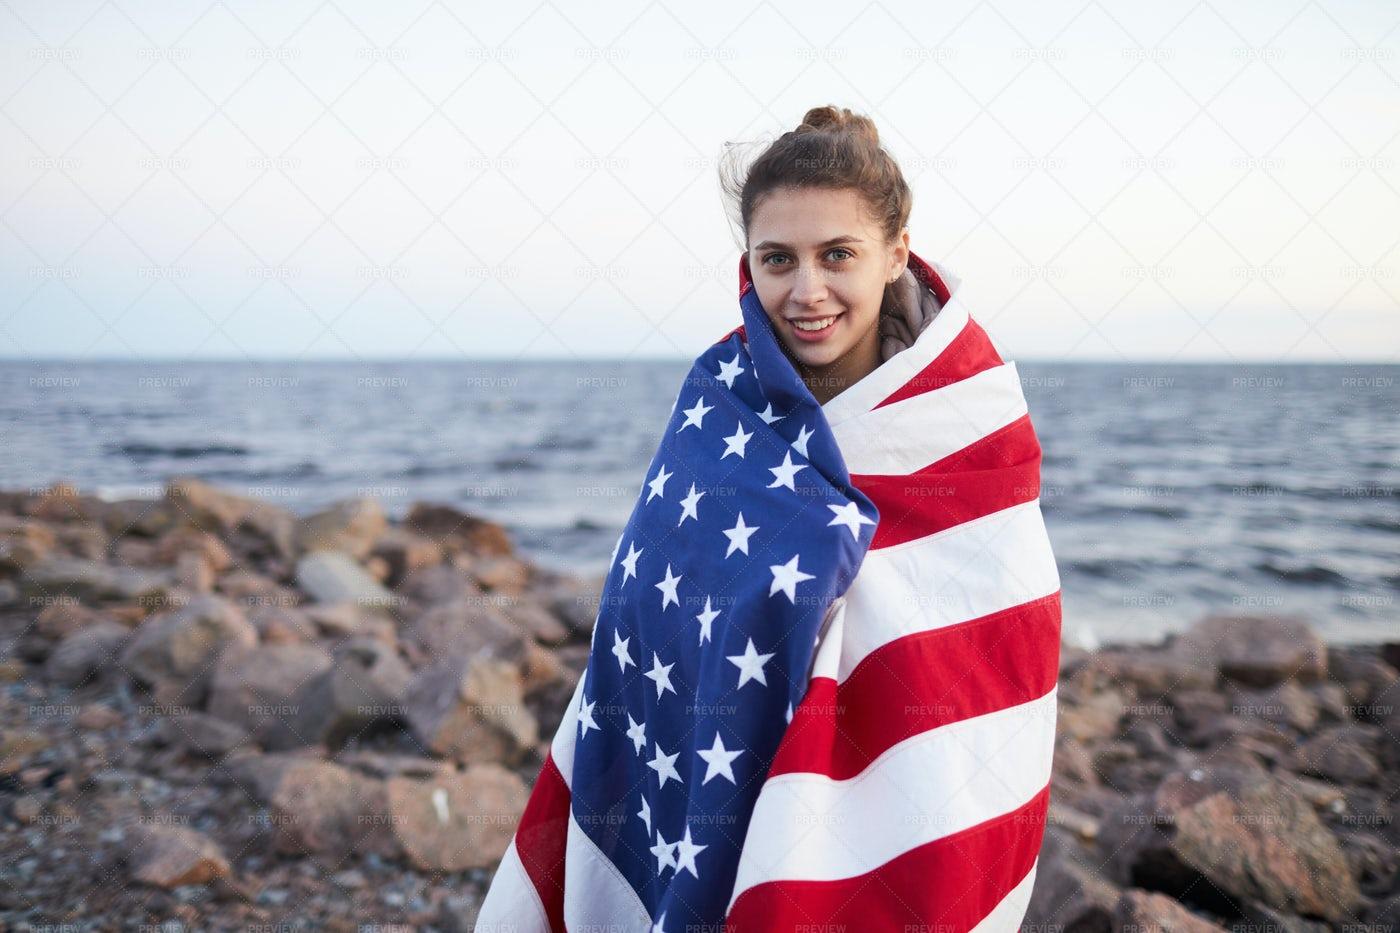 Woman Strolling Over Rocky Shore: Stock Photos